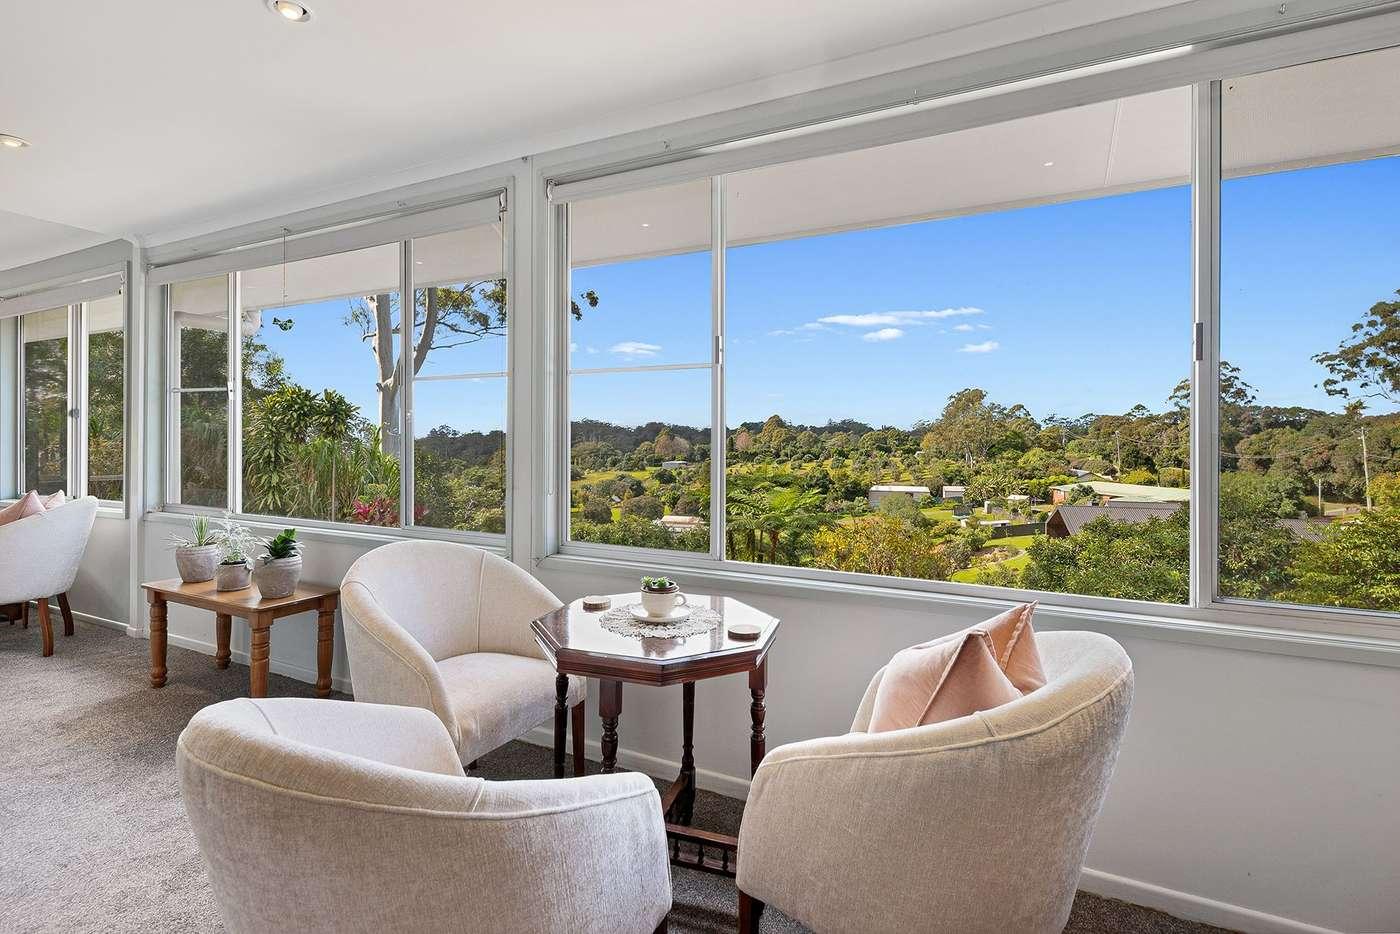 Main view of Homely house listing, 2 St Bernard Street, Tamborine Mountain QLD 4272